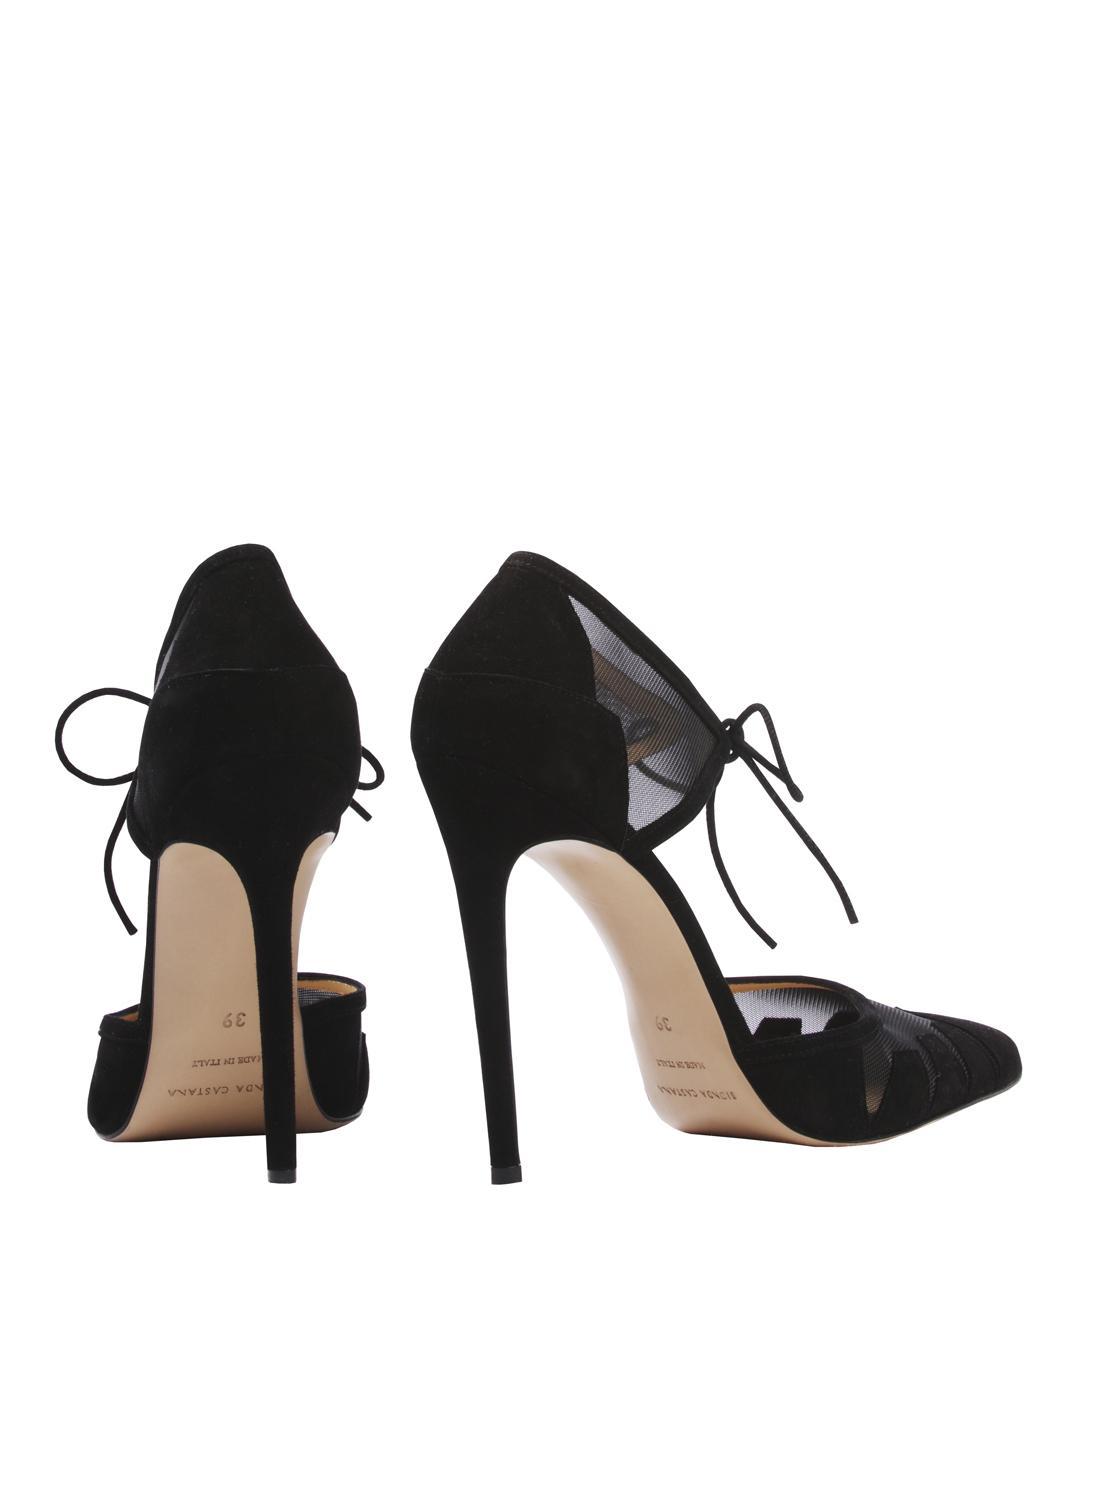 0487bdb4b8a Lyst - Bionda Castana Lana Black Suede Ankle Tie Pumps - Last Pair ...